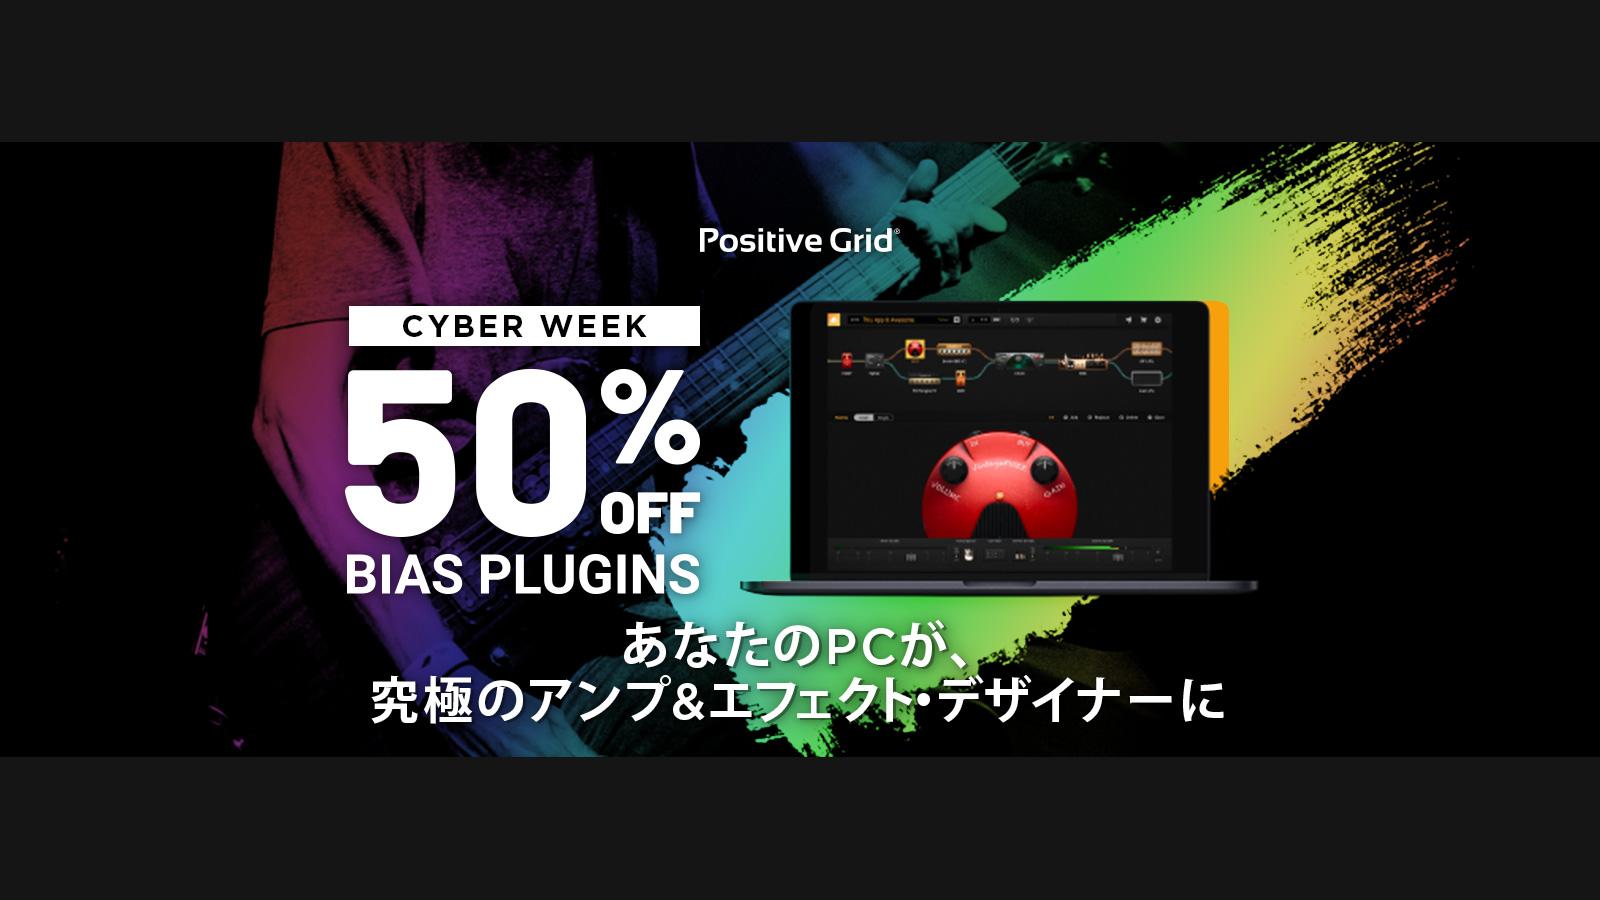 Positive Grid Cyber Week Software Promotion